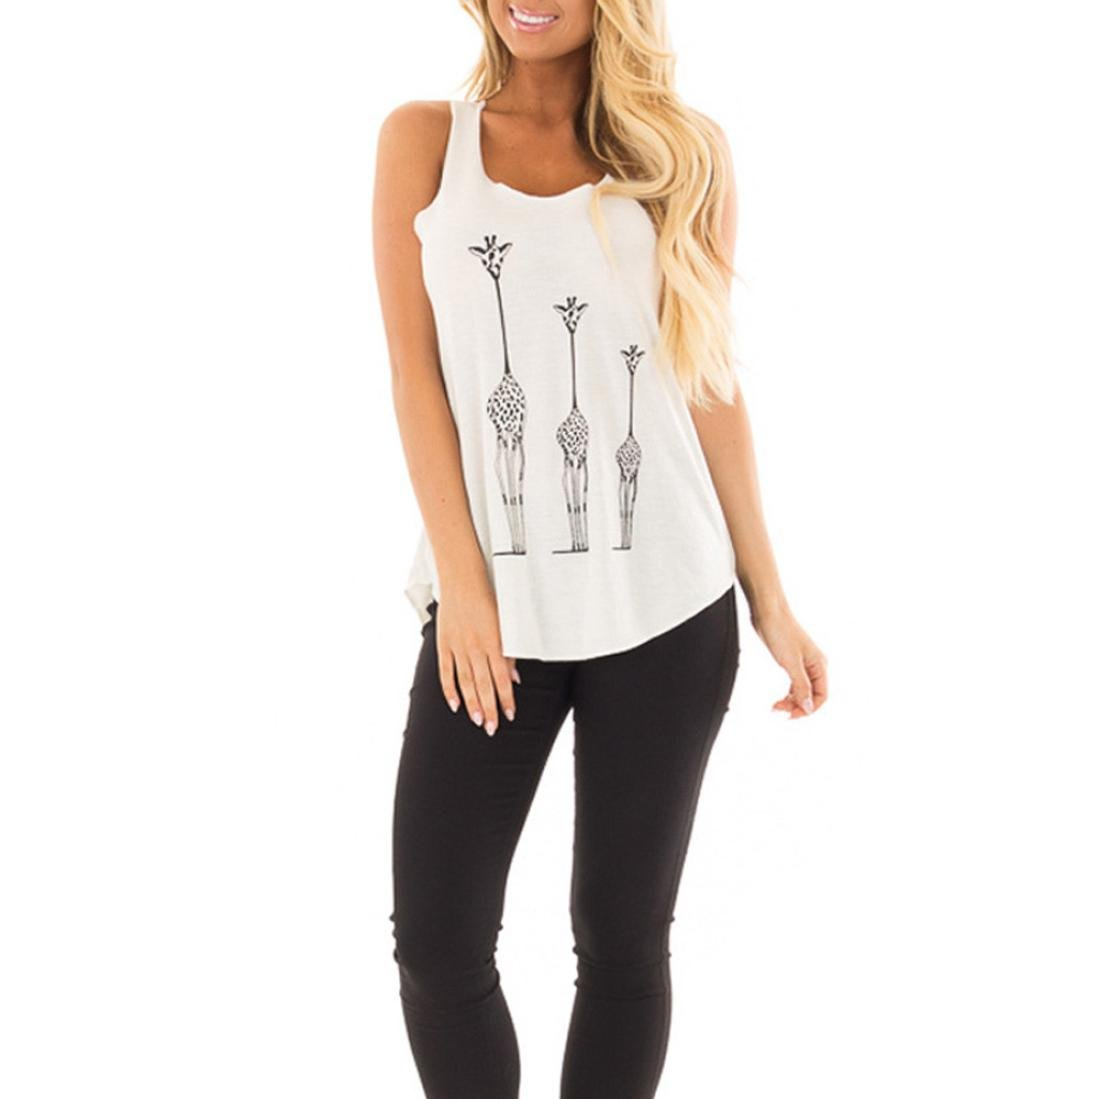 Paymenow Tank Tops For Women, Women Fashion Summer Vest Casual Giraffe Print Sleeveless Loose Fits Shirts Blouse (XL, White)